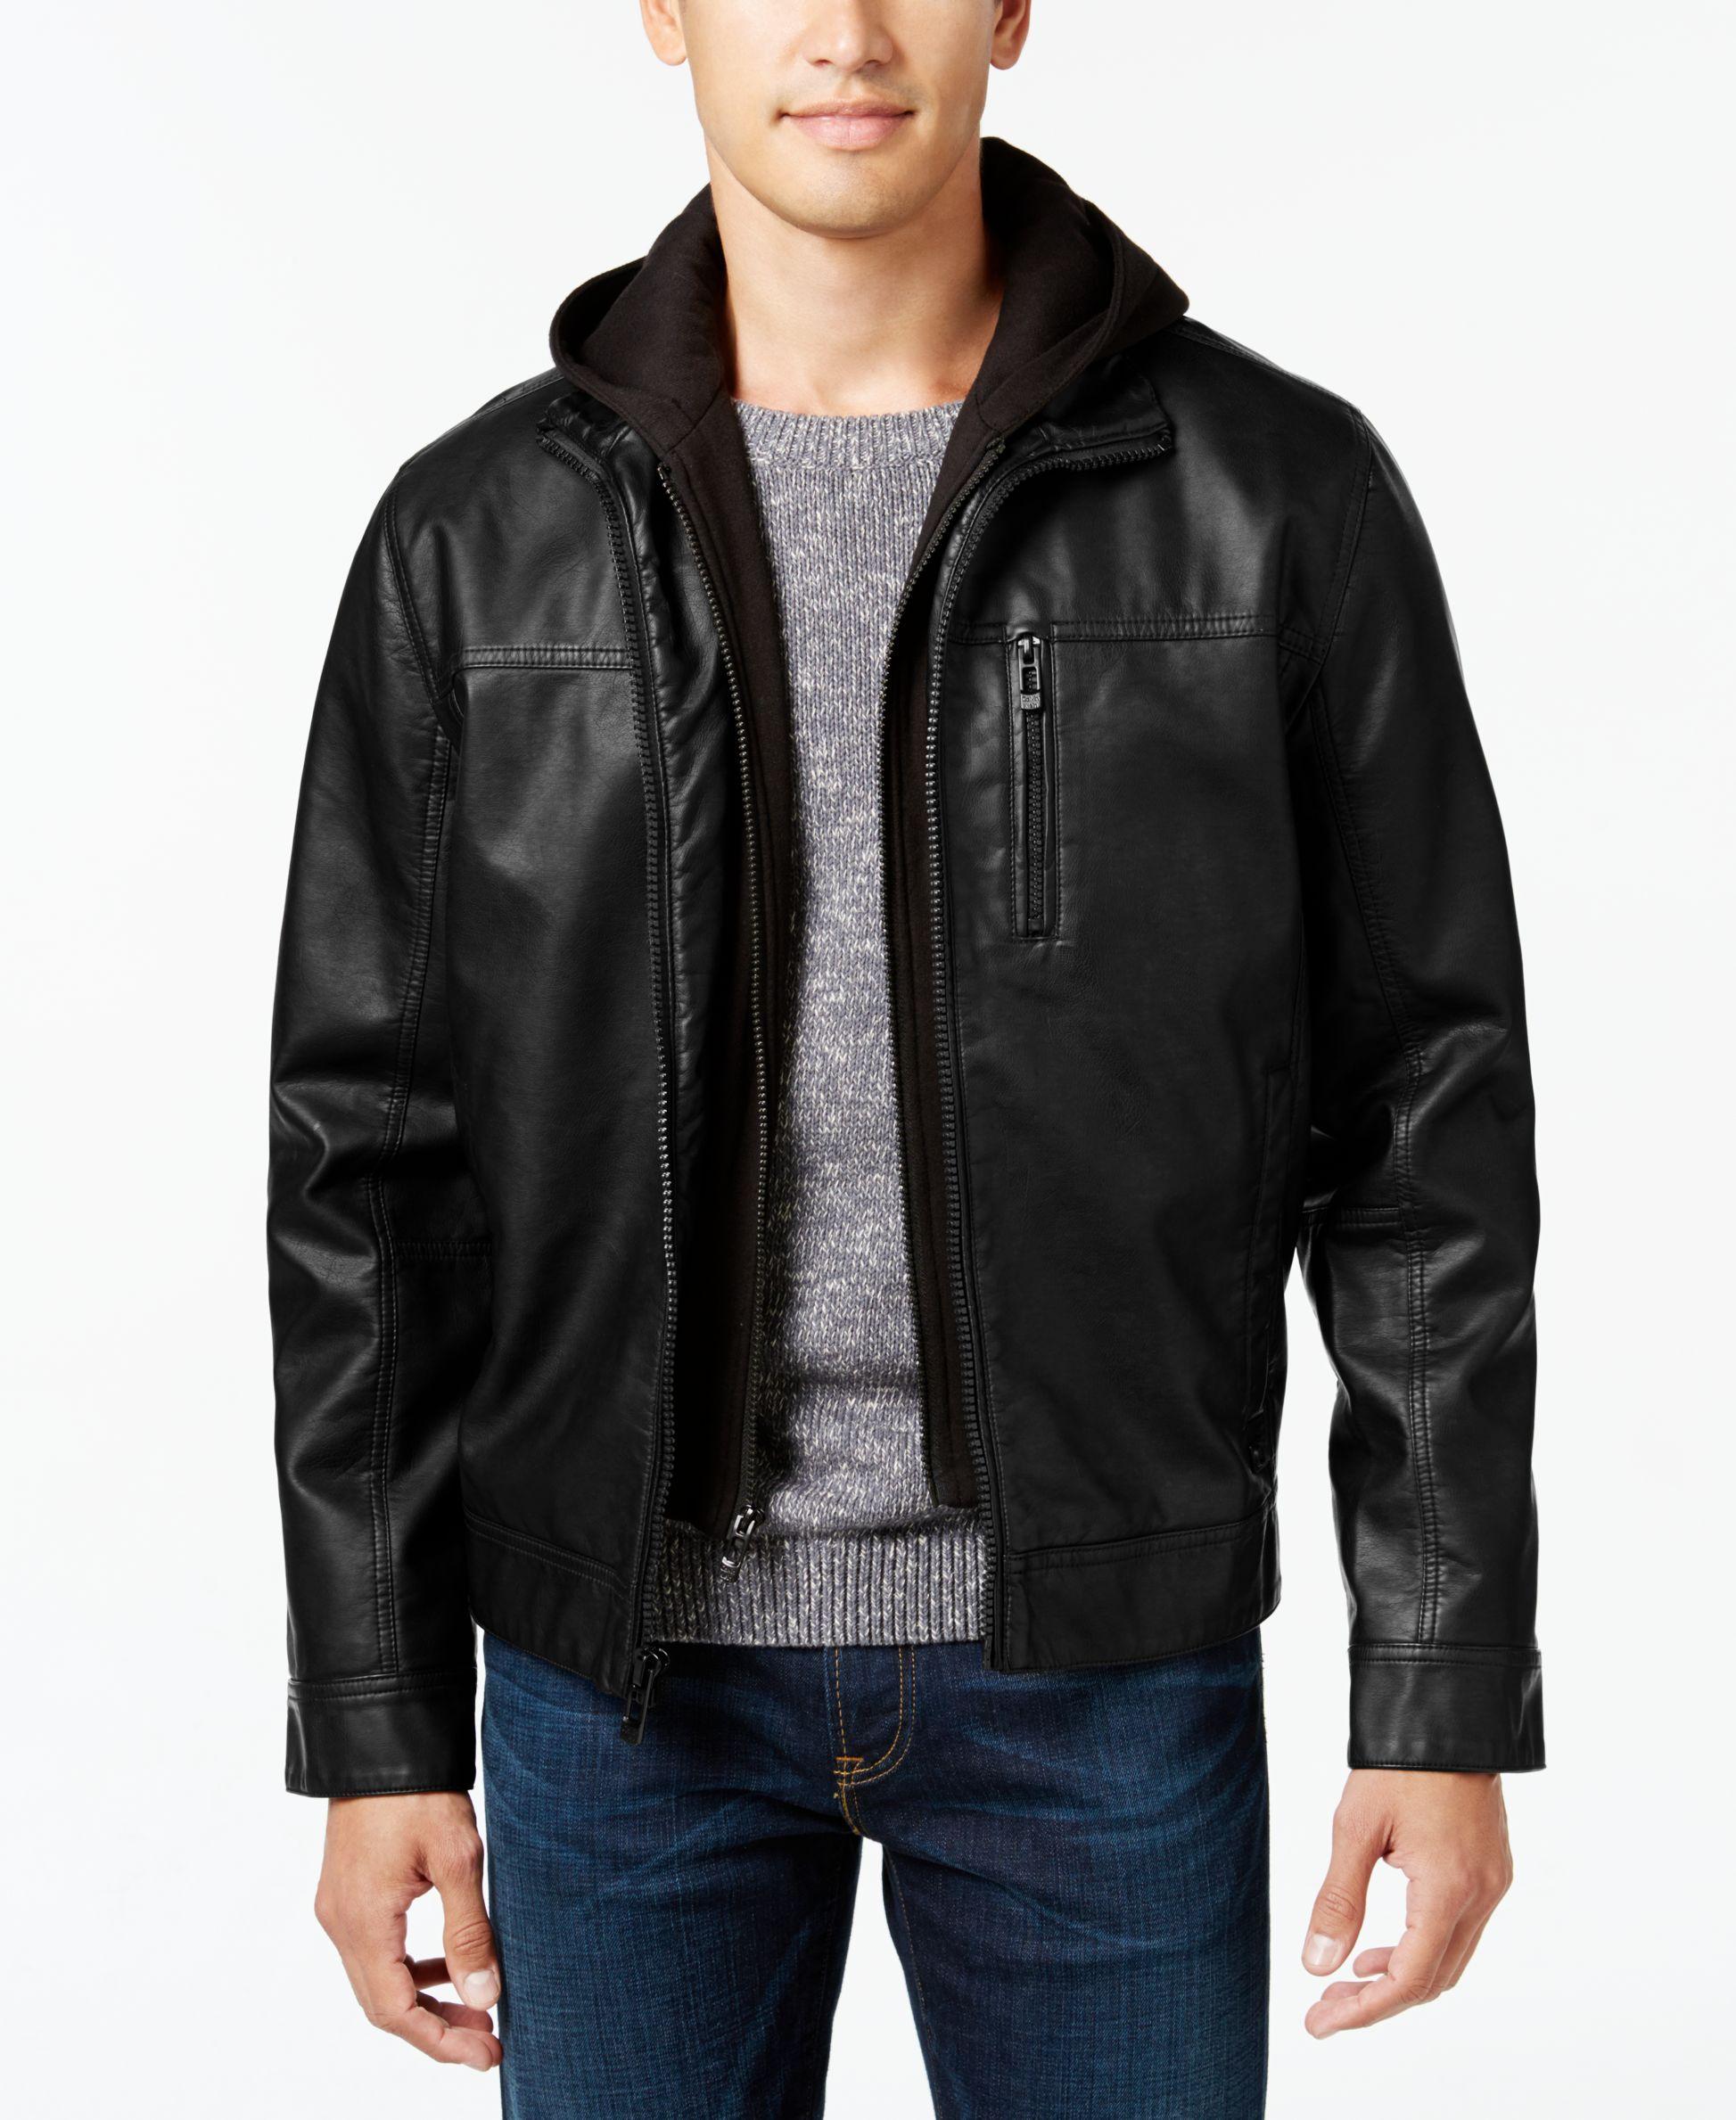 Calvin Klein Men S Faux Leather Hooded Jacket Faux Leather Hooded Jacket Leather Jacket With Hood Leather Jacket Men [ 2378 x 1947 Pixel ]